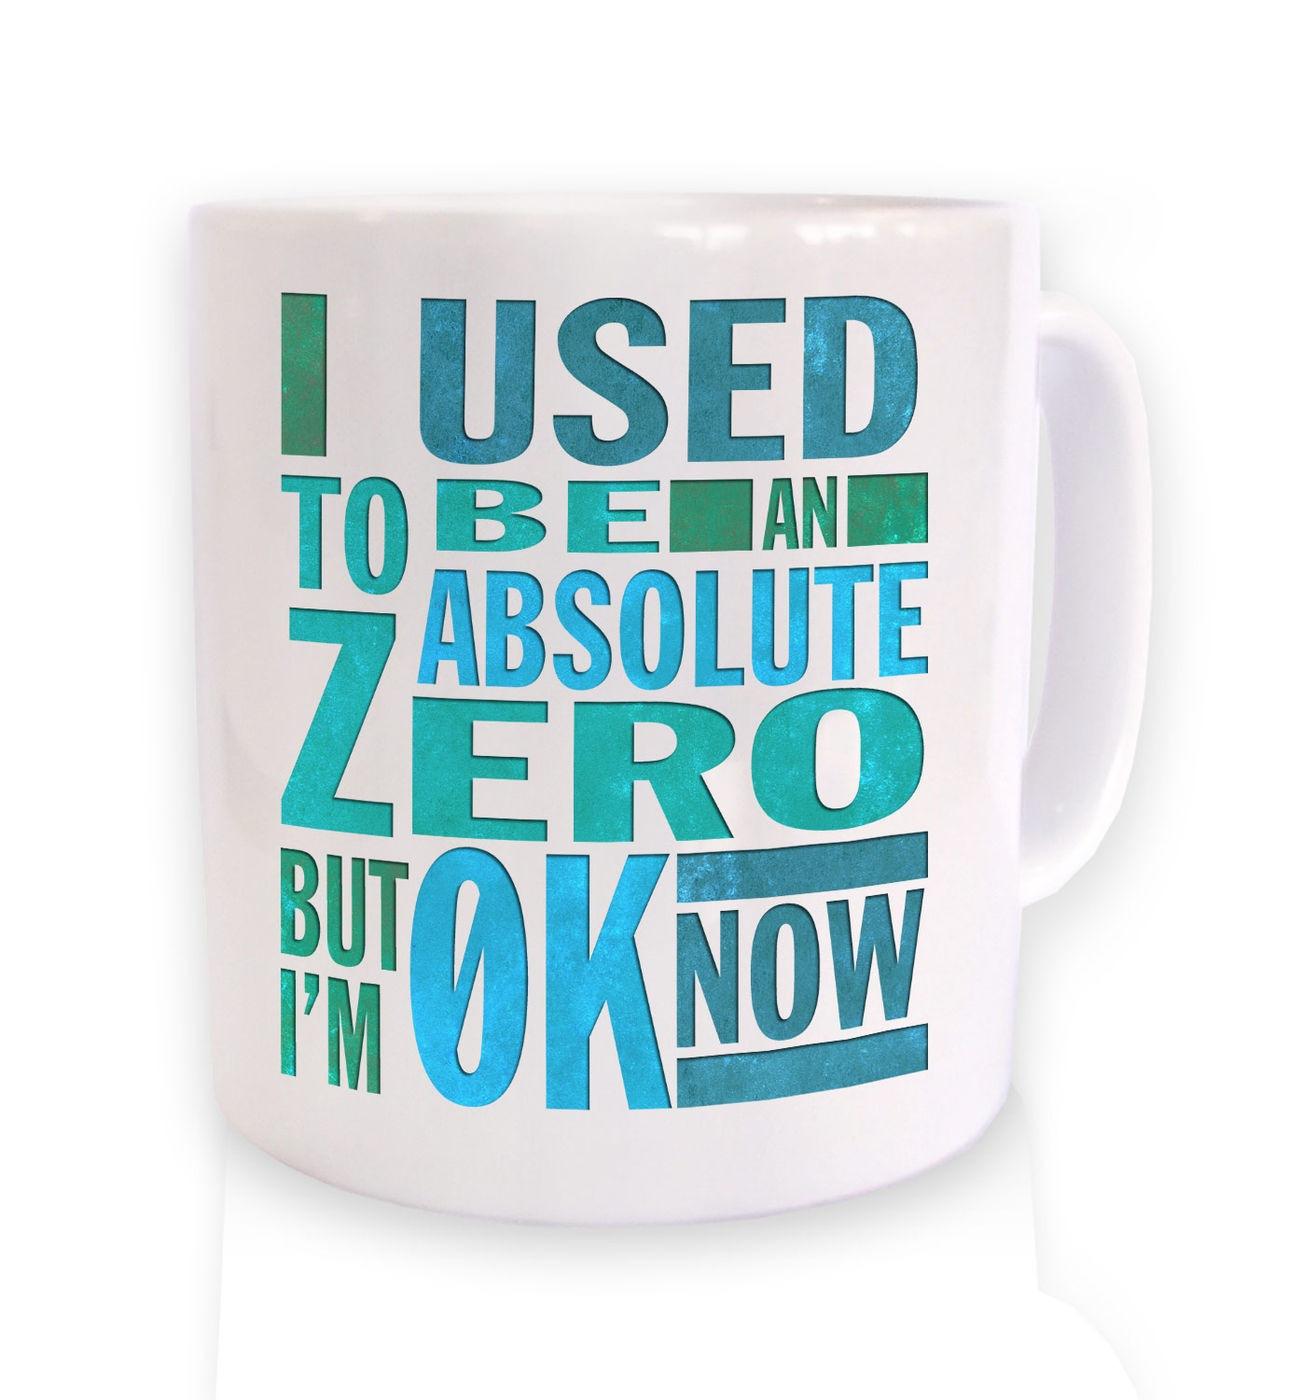 Absolute Zero 0K Now mug - funny science slogan coffee mug